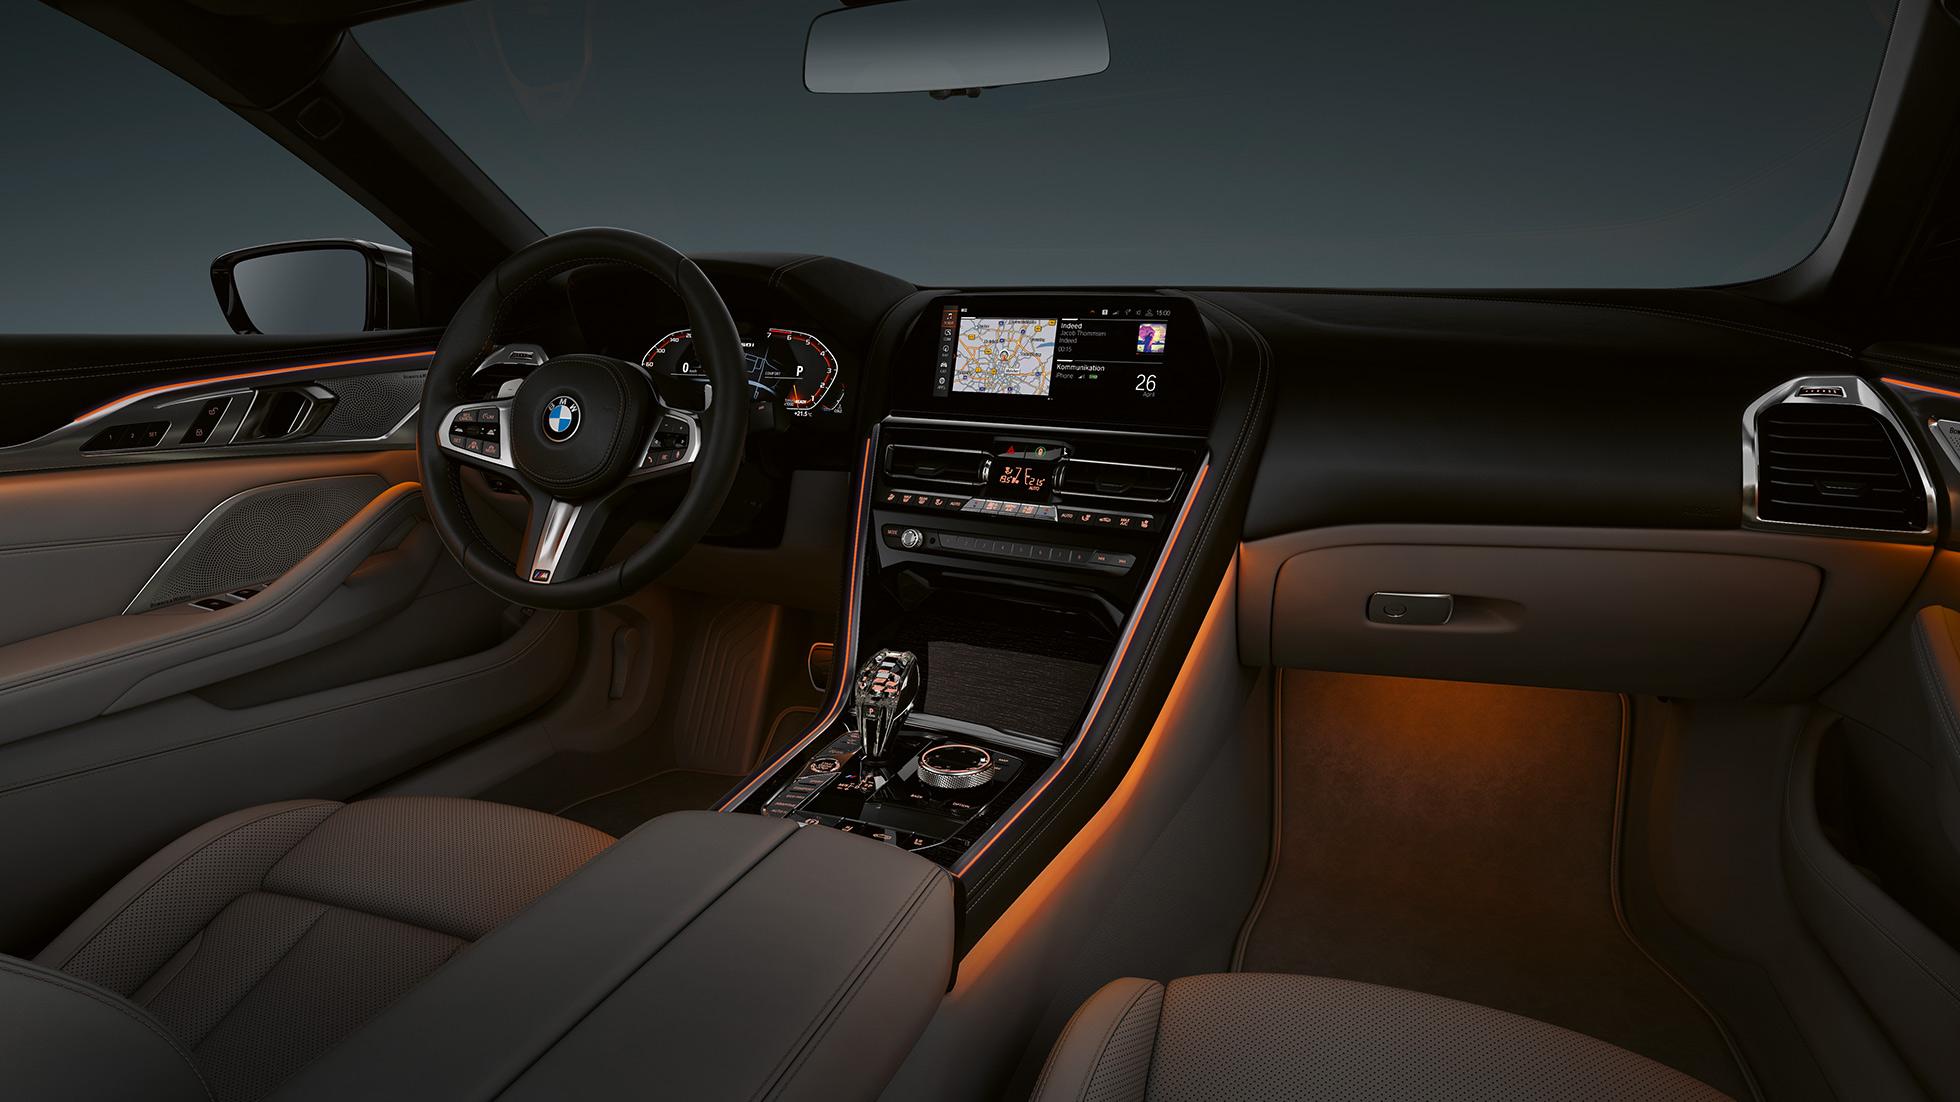 BMW M850i xDrive, интерьер, подсветка Ambient light.